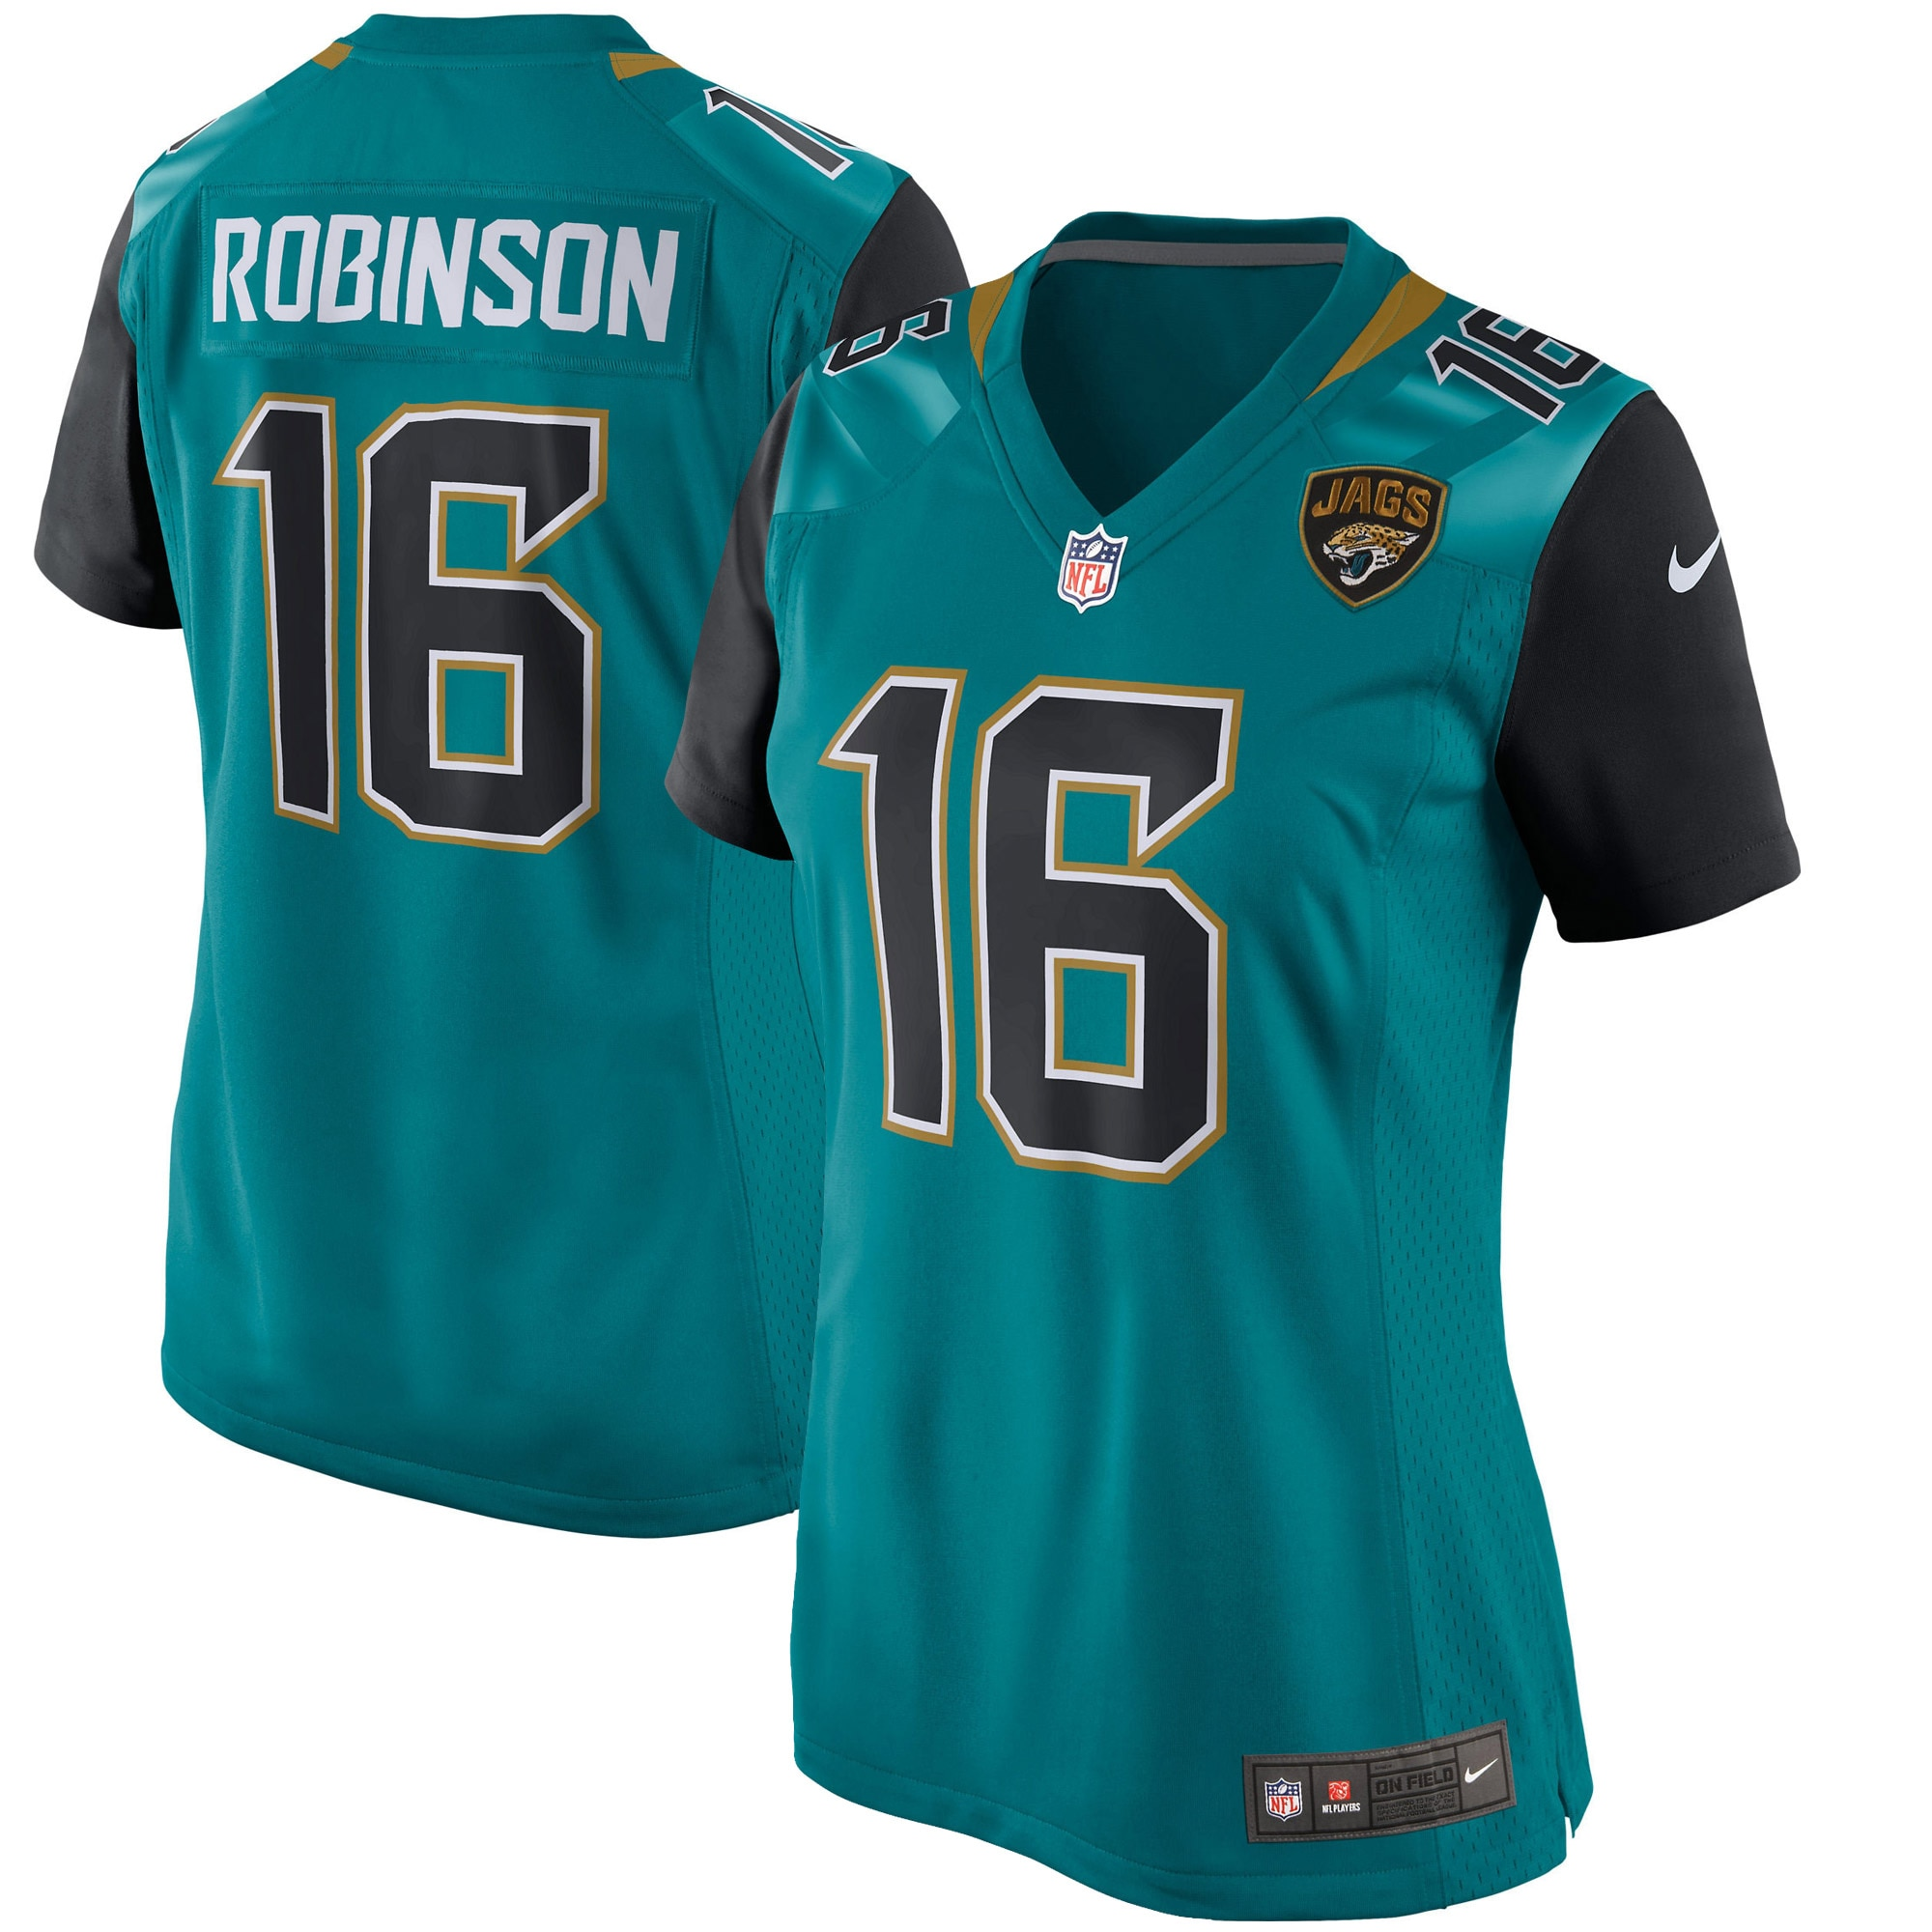 Denard Robinson Jacksonville Jaguars Nike Women's Game Jersey - Teal